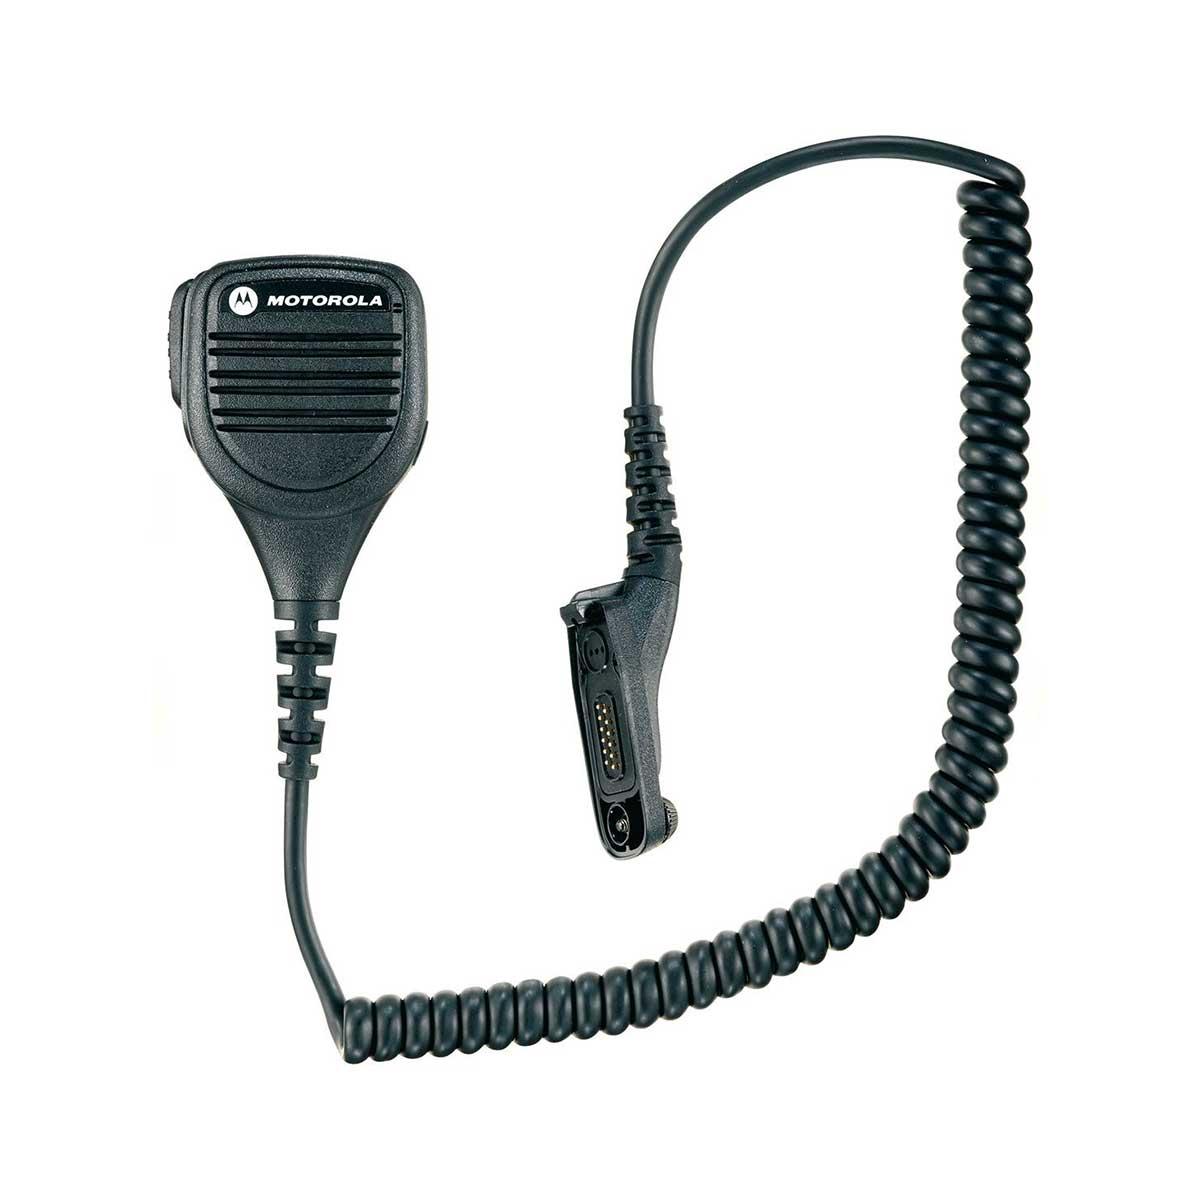 Micrófono Motorola parlante de solapa PMMN4062 IMPRES